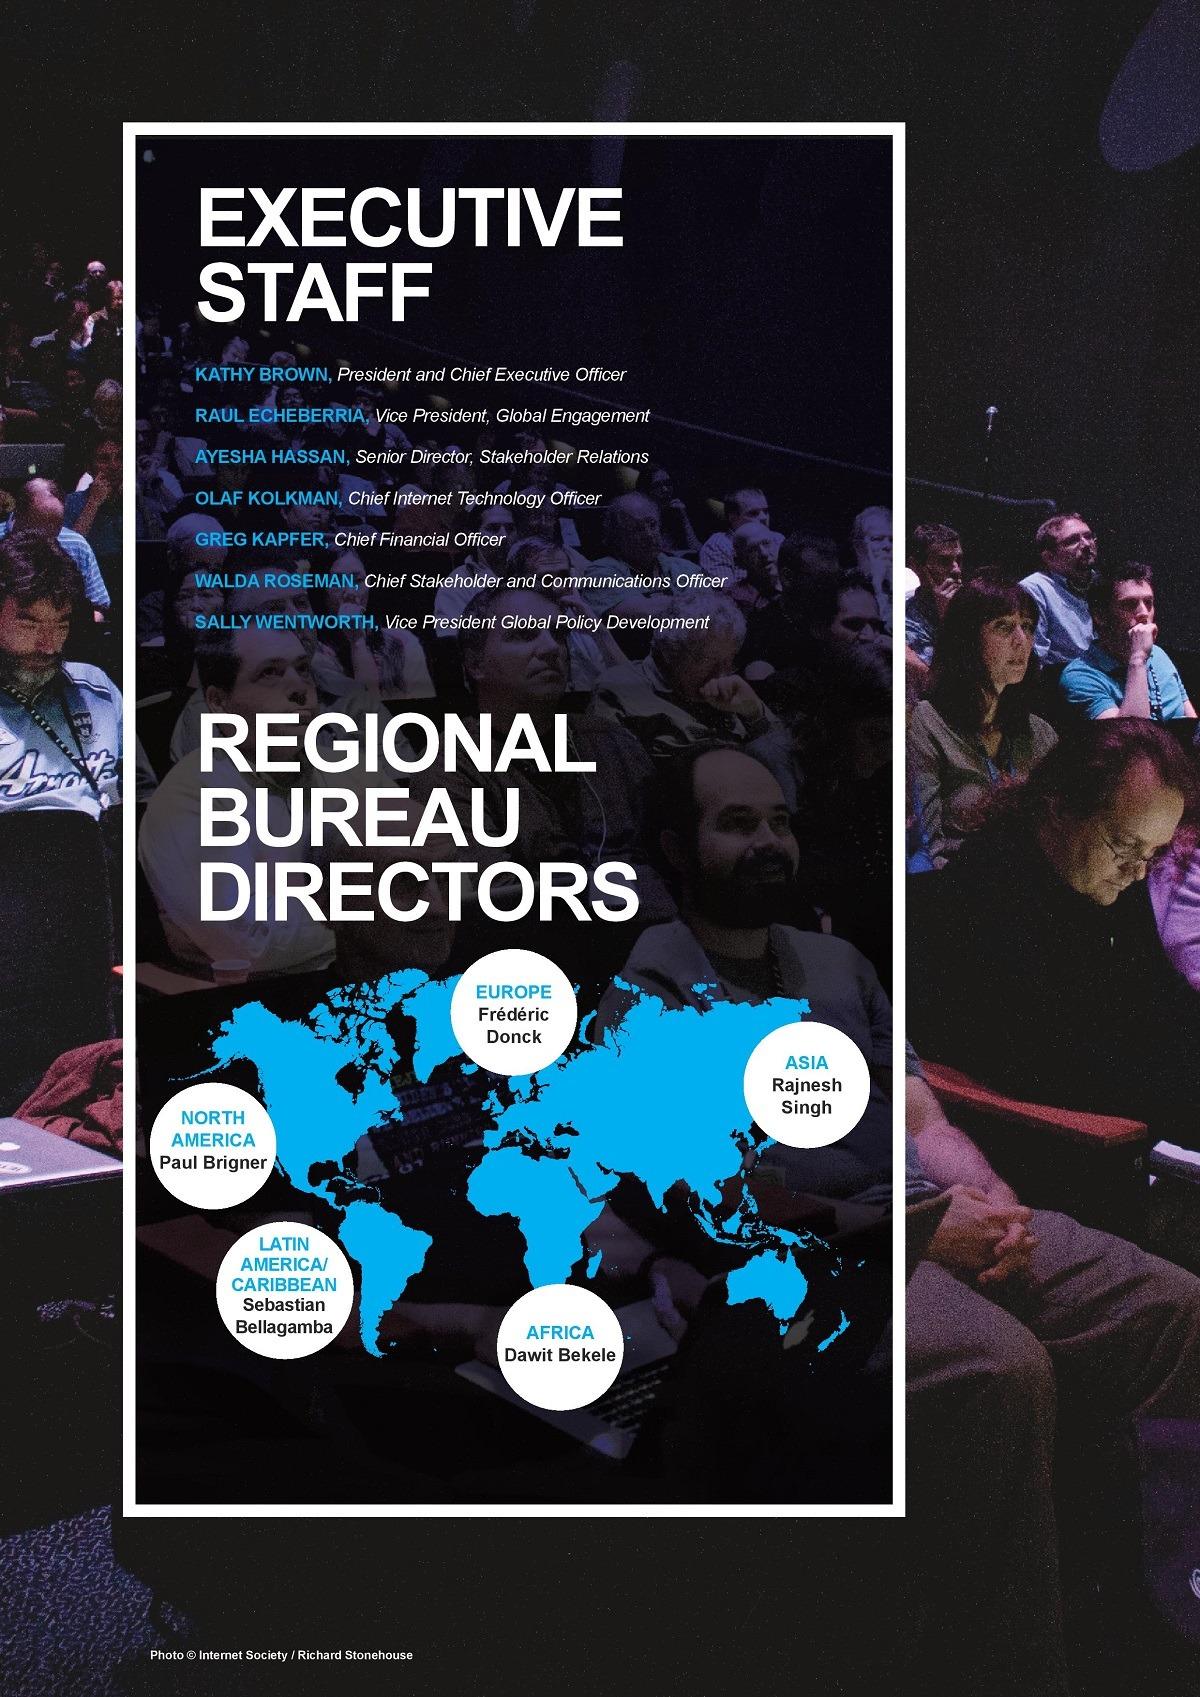 rev-AnnualReportStaff-20150825-en1-page-001